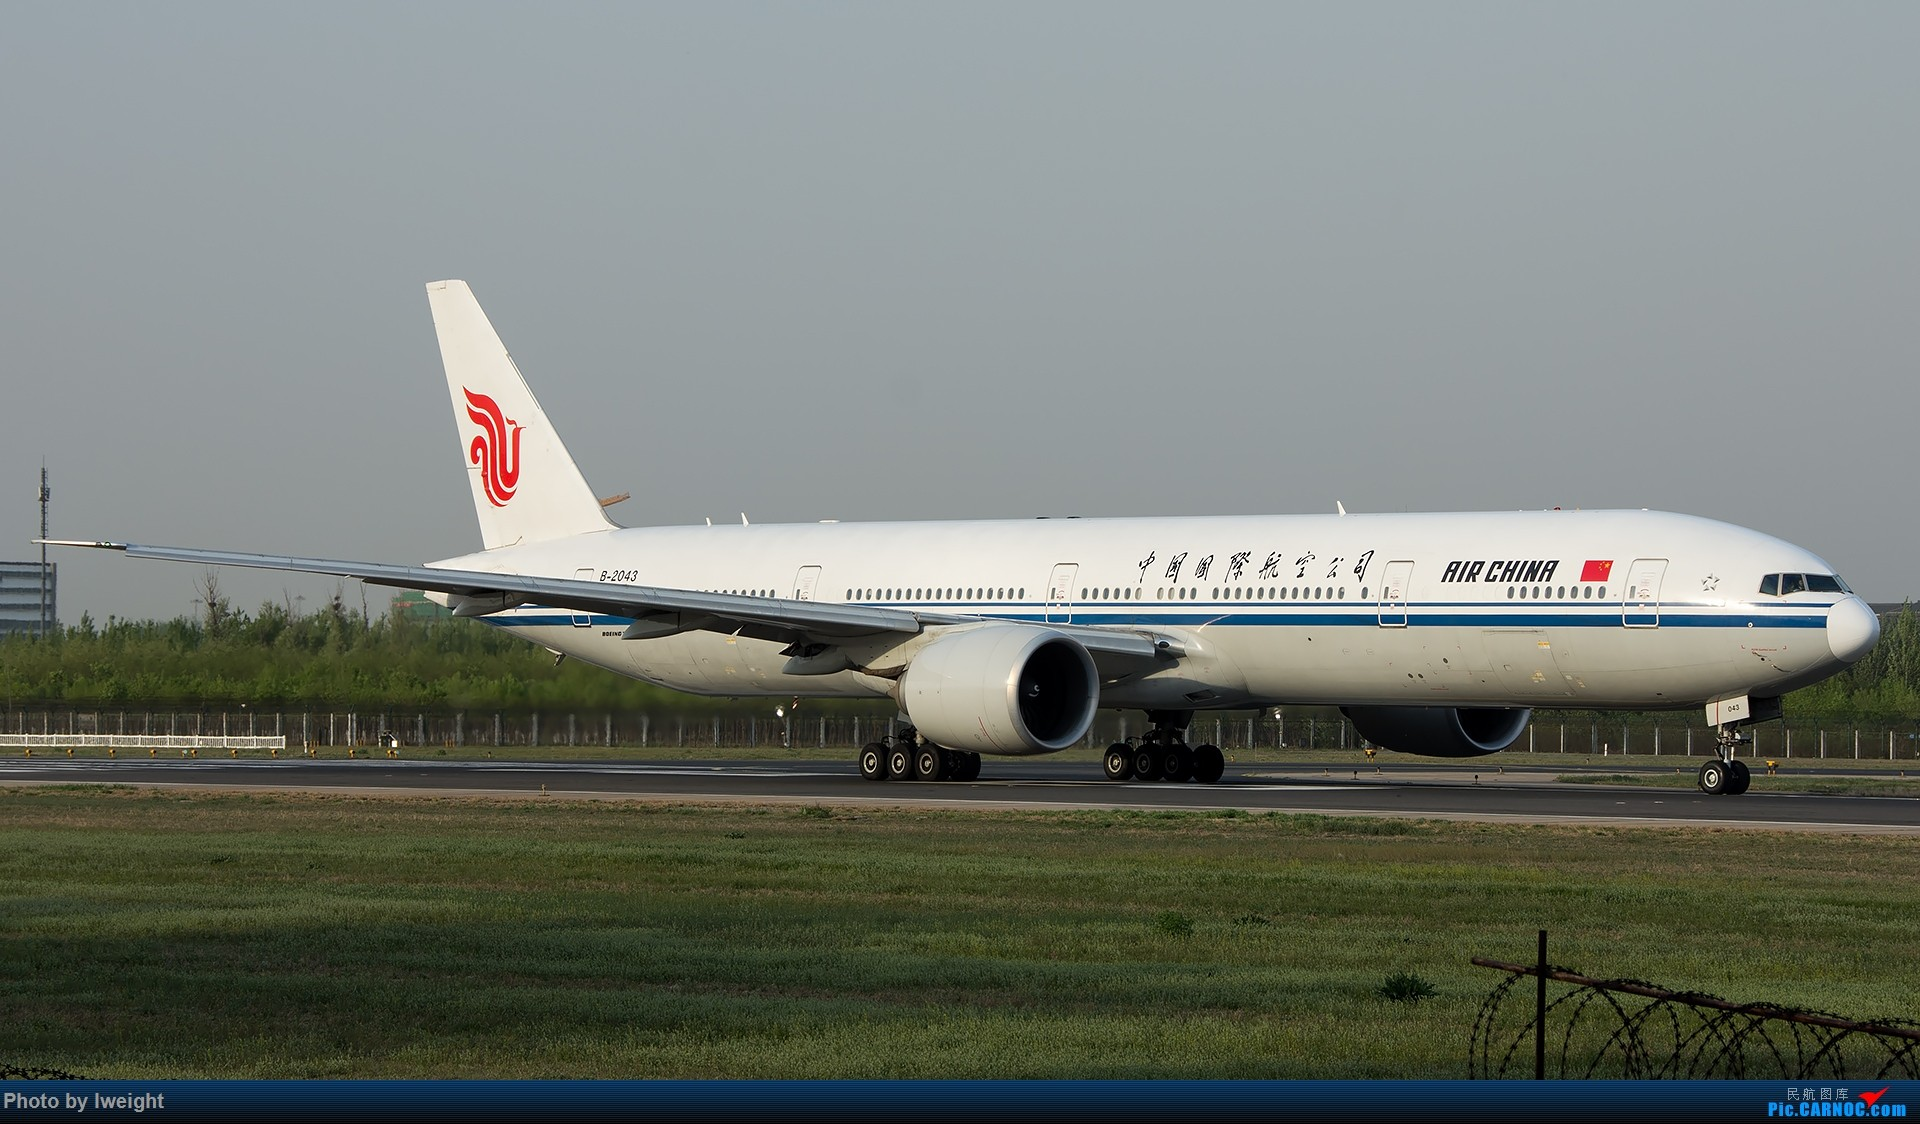 Re:[原创]天气晴朗,继续守候18R【多图】 BOEING 777-300ER B-2043 中国北京首都国际机场